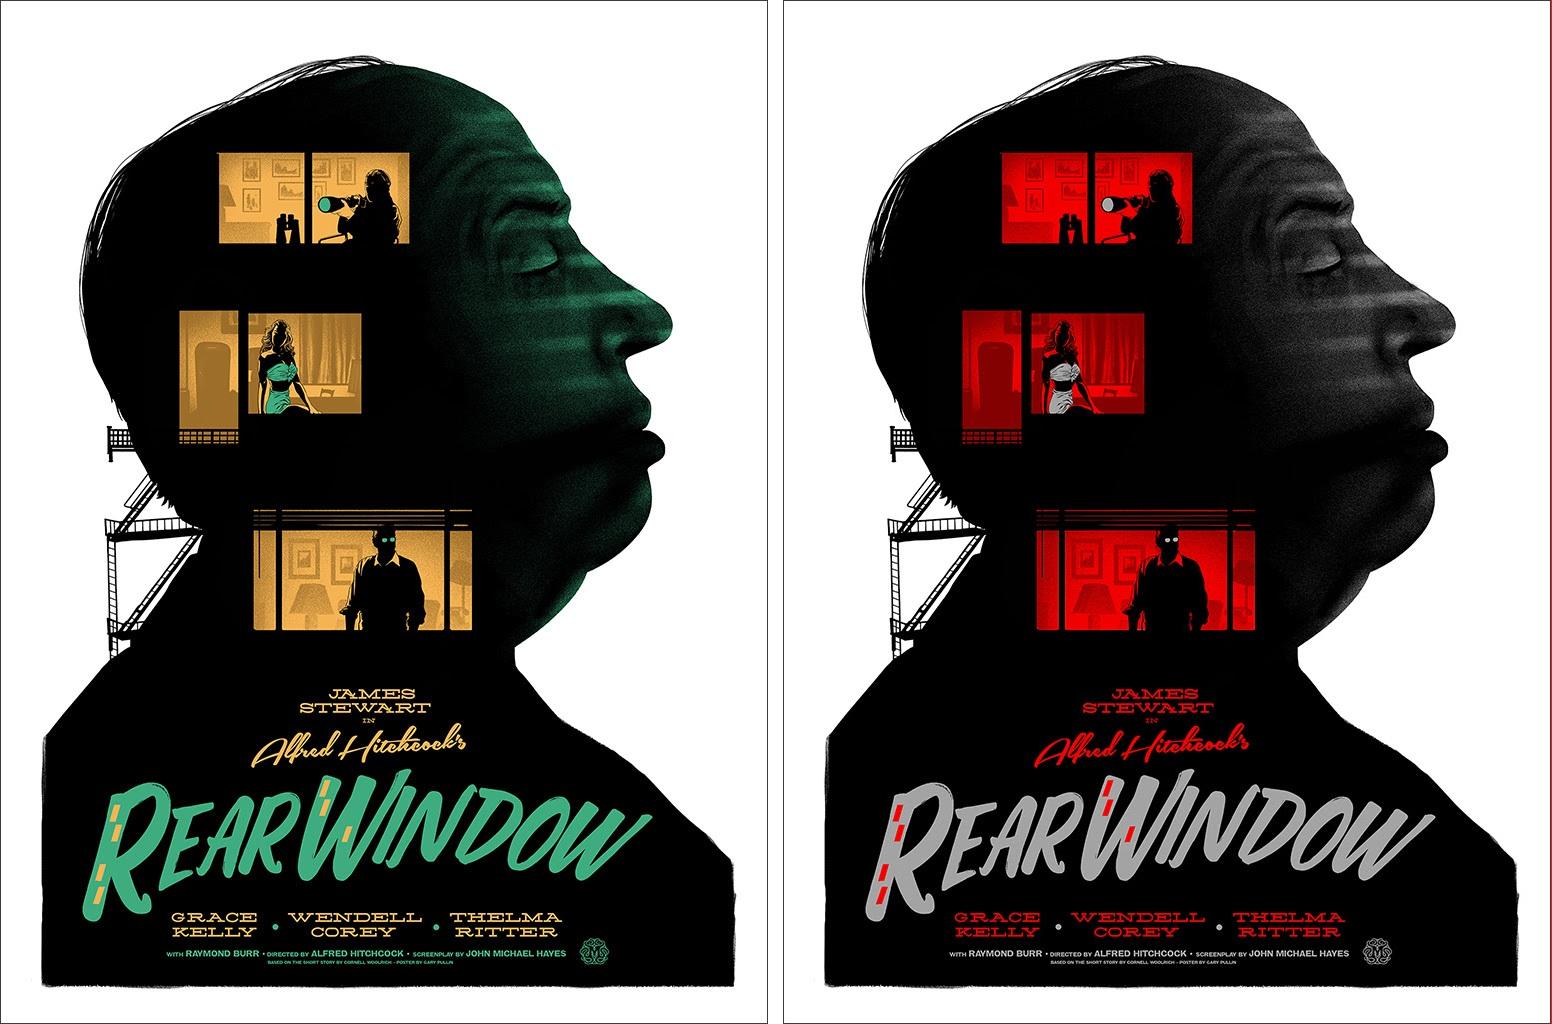 rear window movie poster screen print